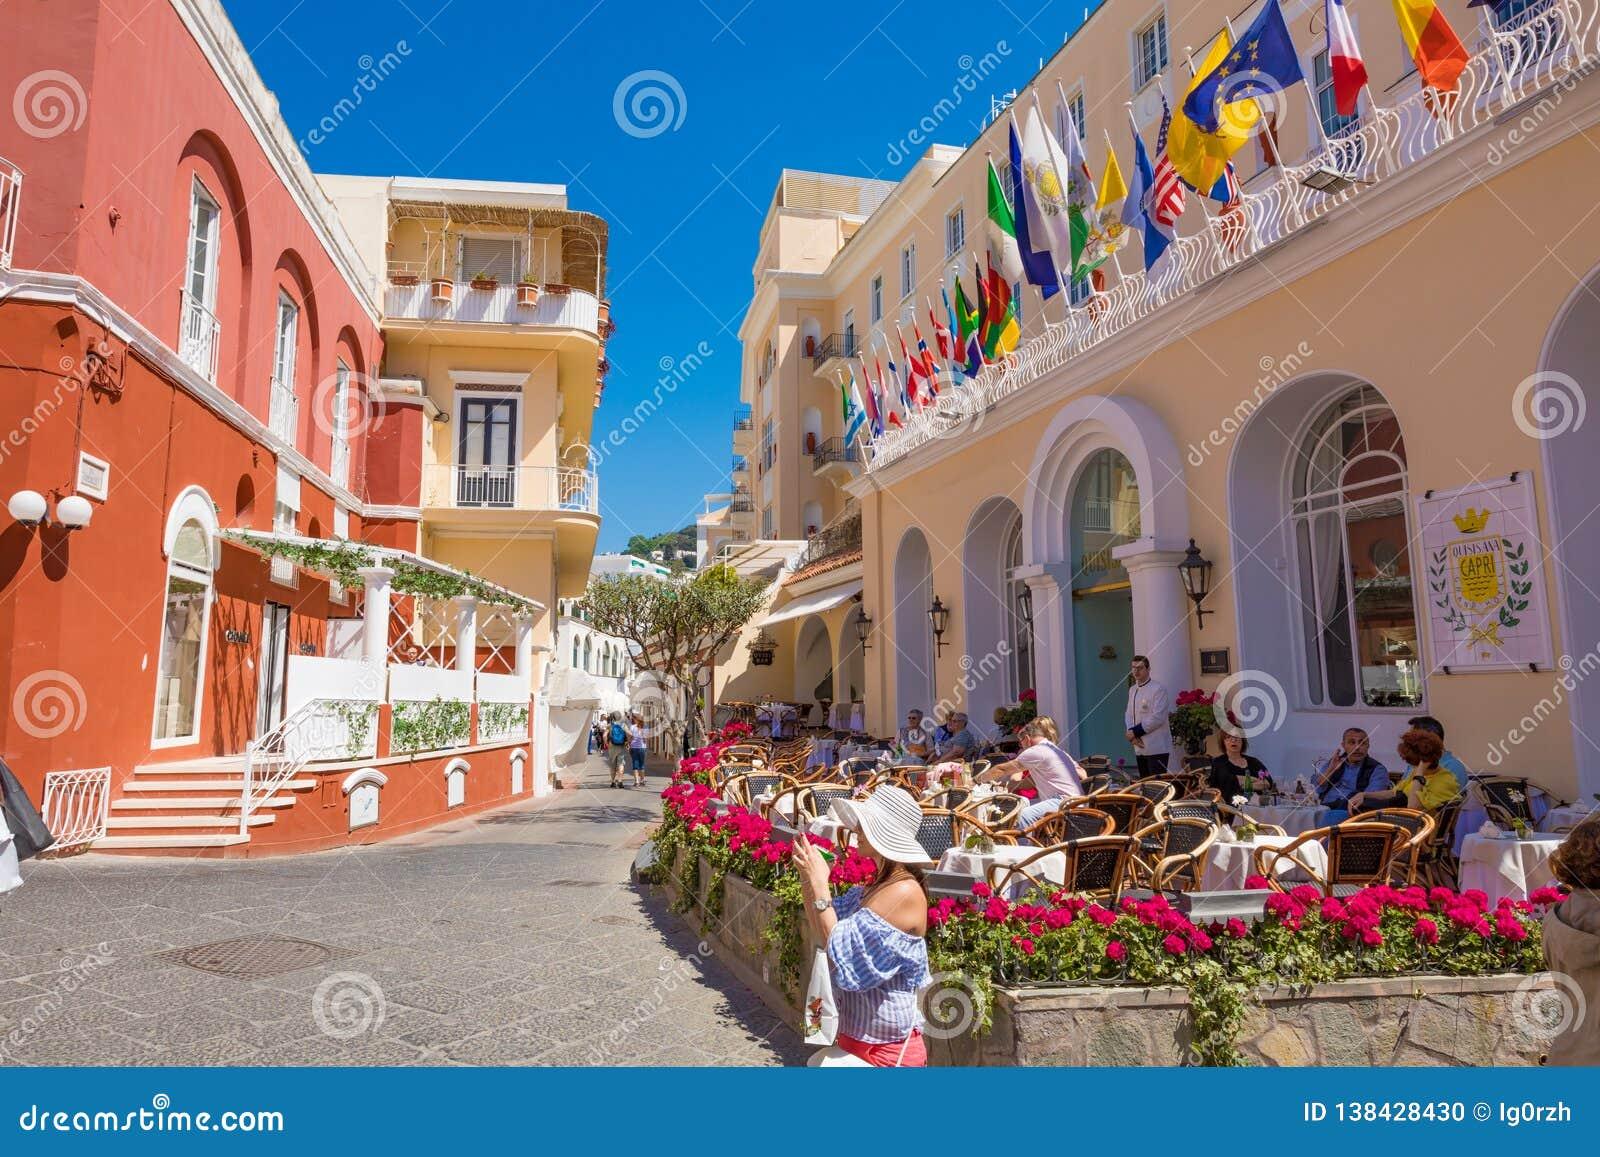 Sunny Day On Capri Island Italy Editorial Image Image Of Street